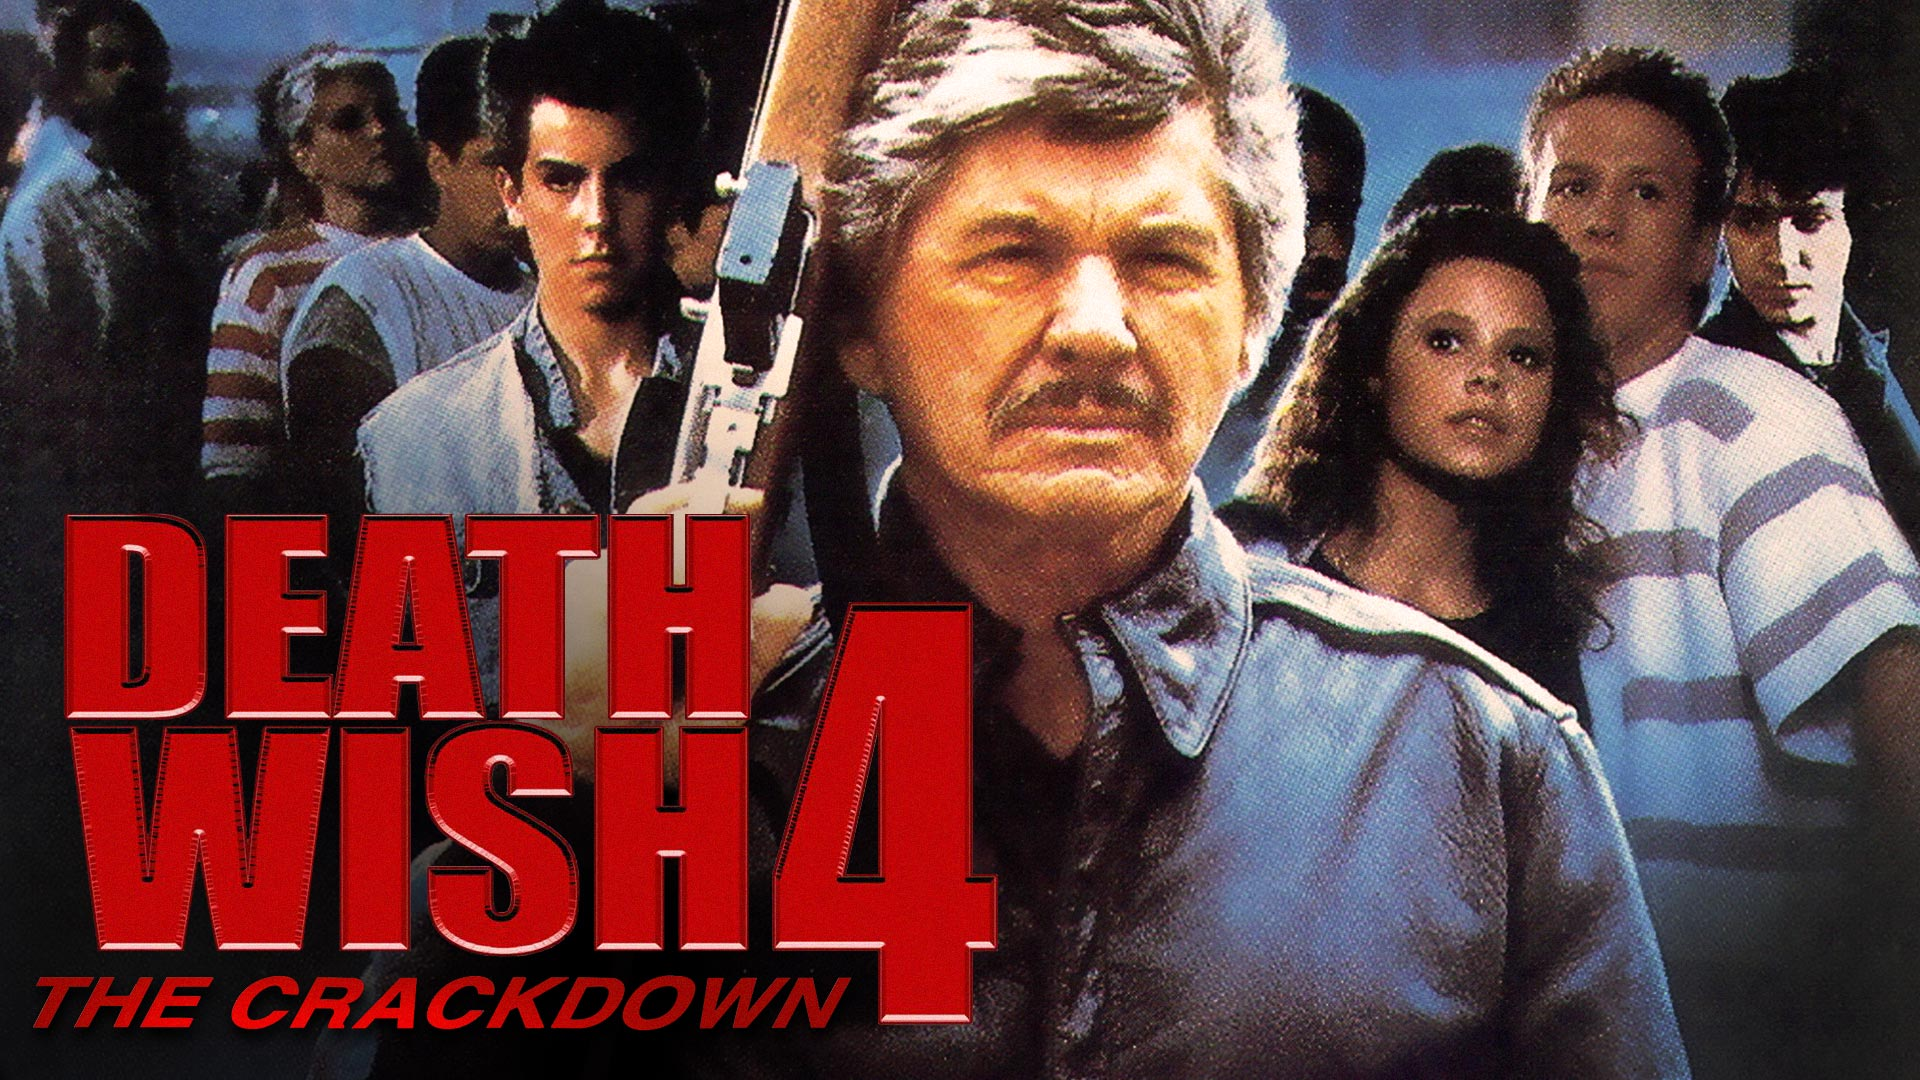 Death Wish IV